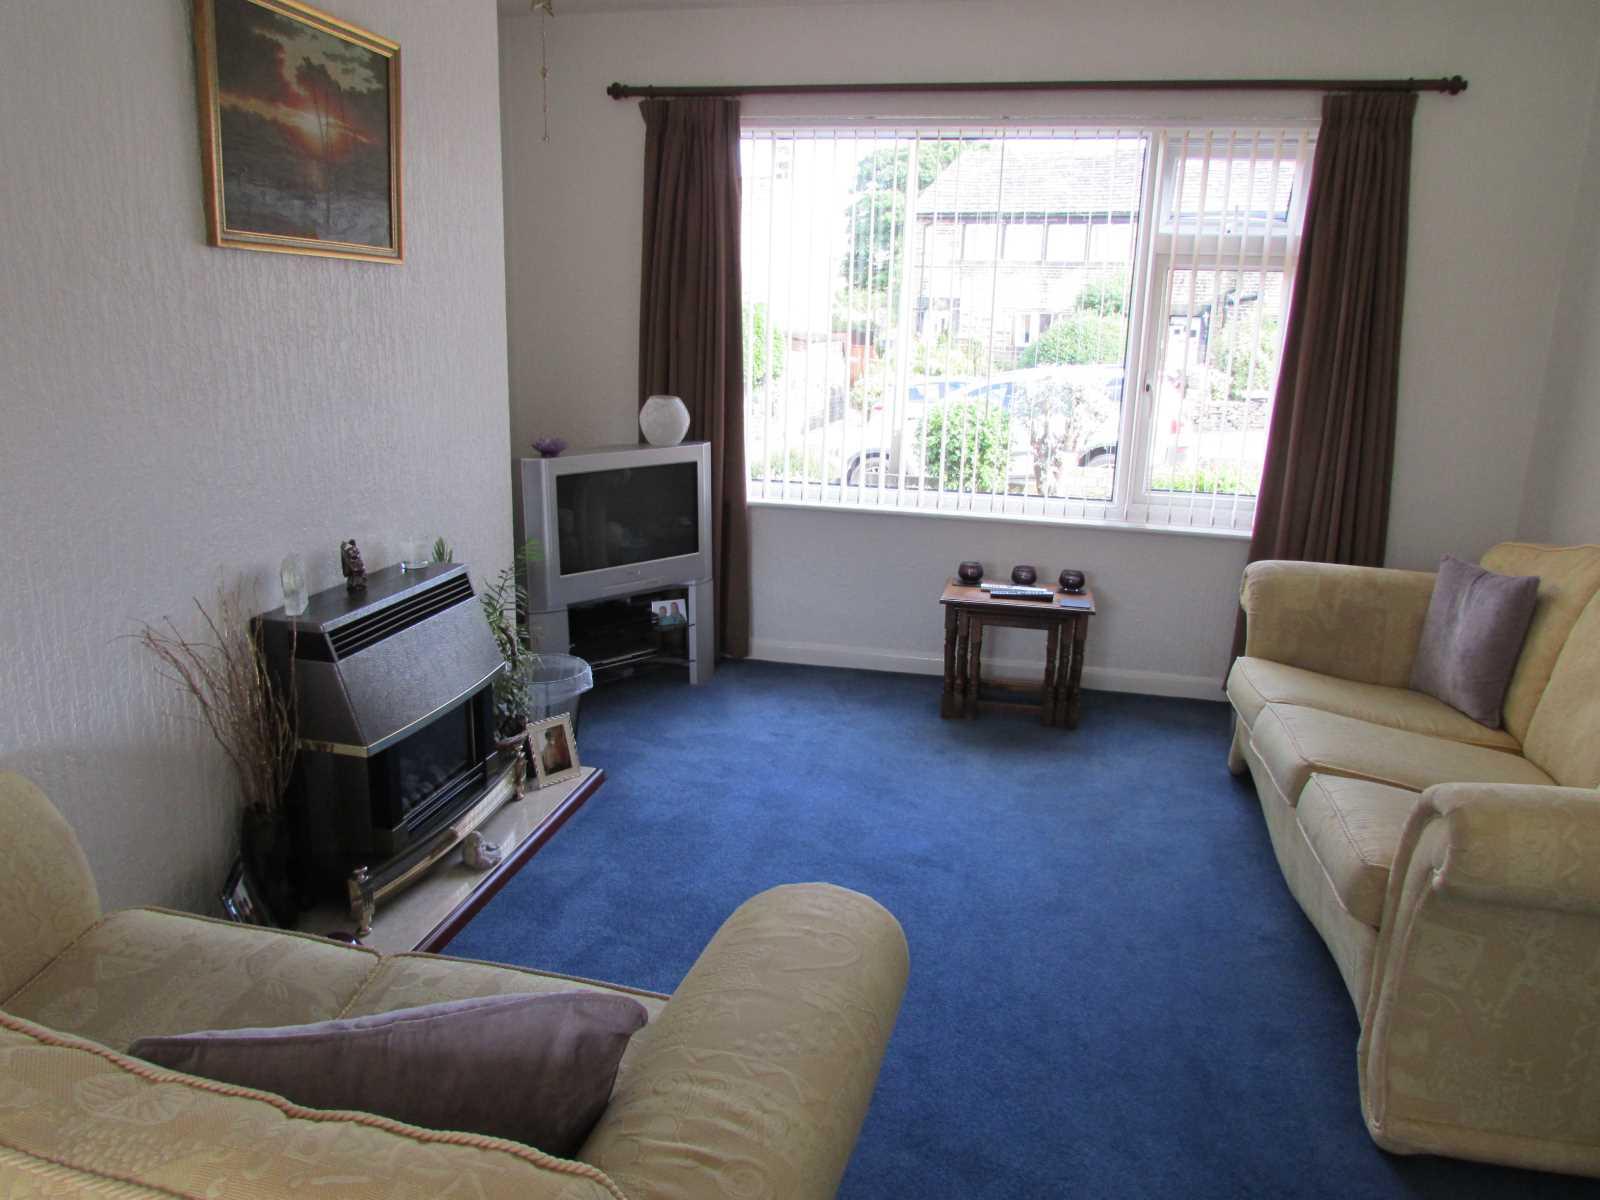 45 Town Moor Lane Thurstonland, Huddersfield, HD4 6XF, UK